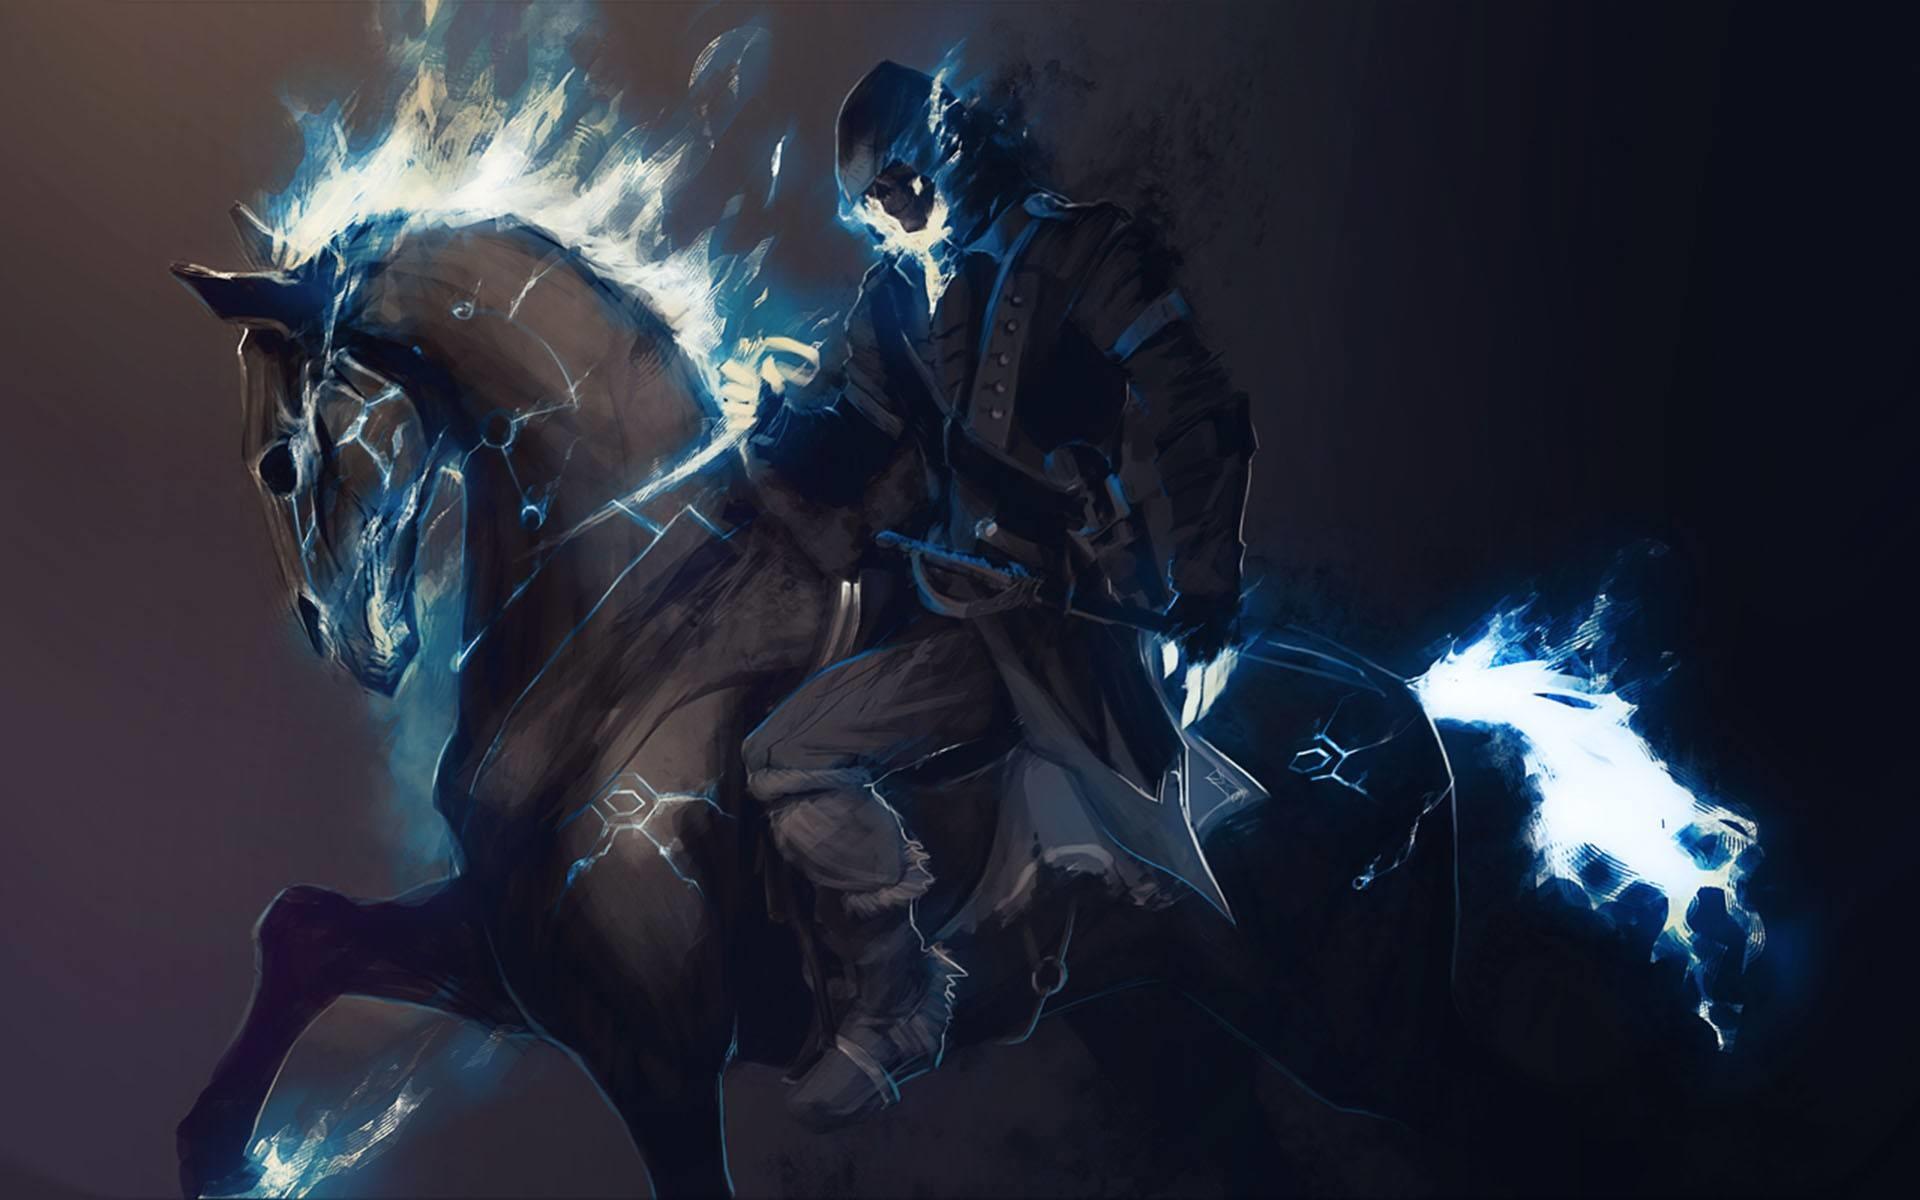 wallpaper horse fantasy painting digital fire 1920×1200